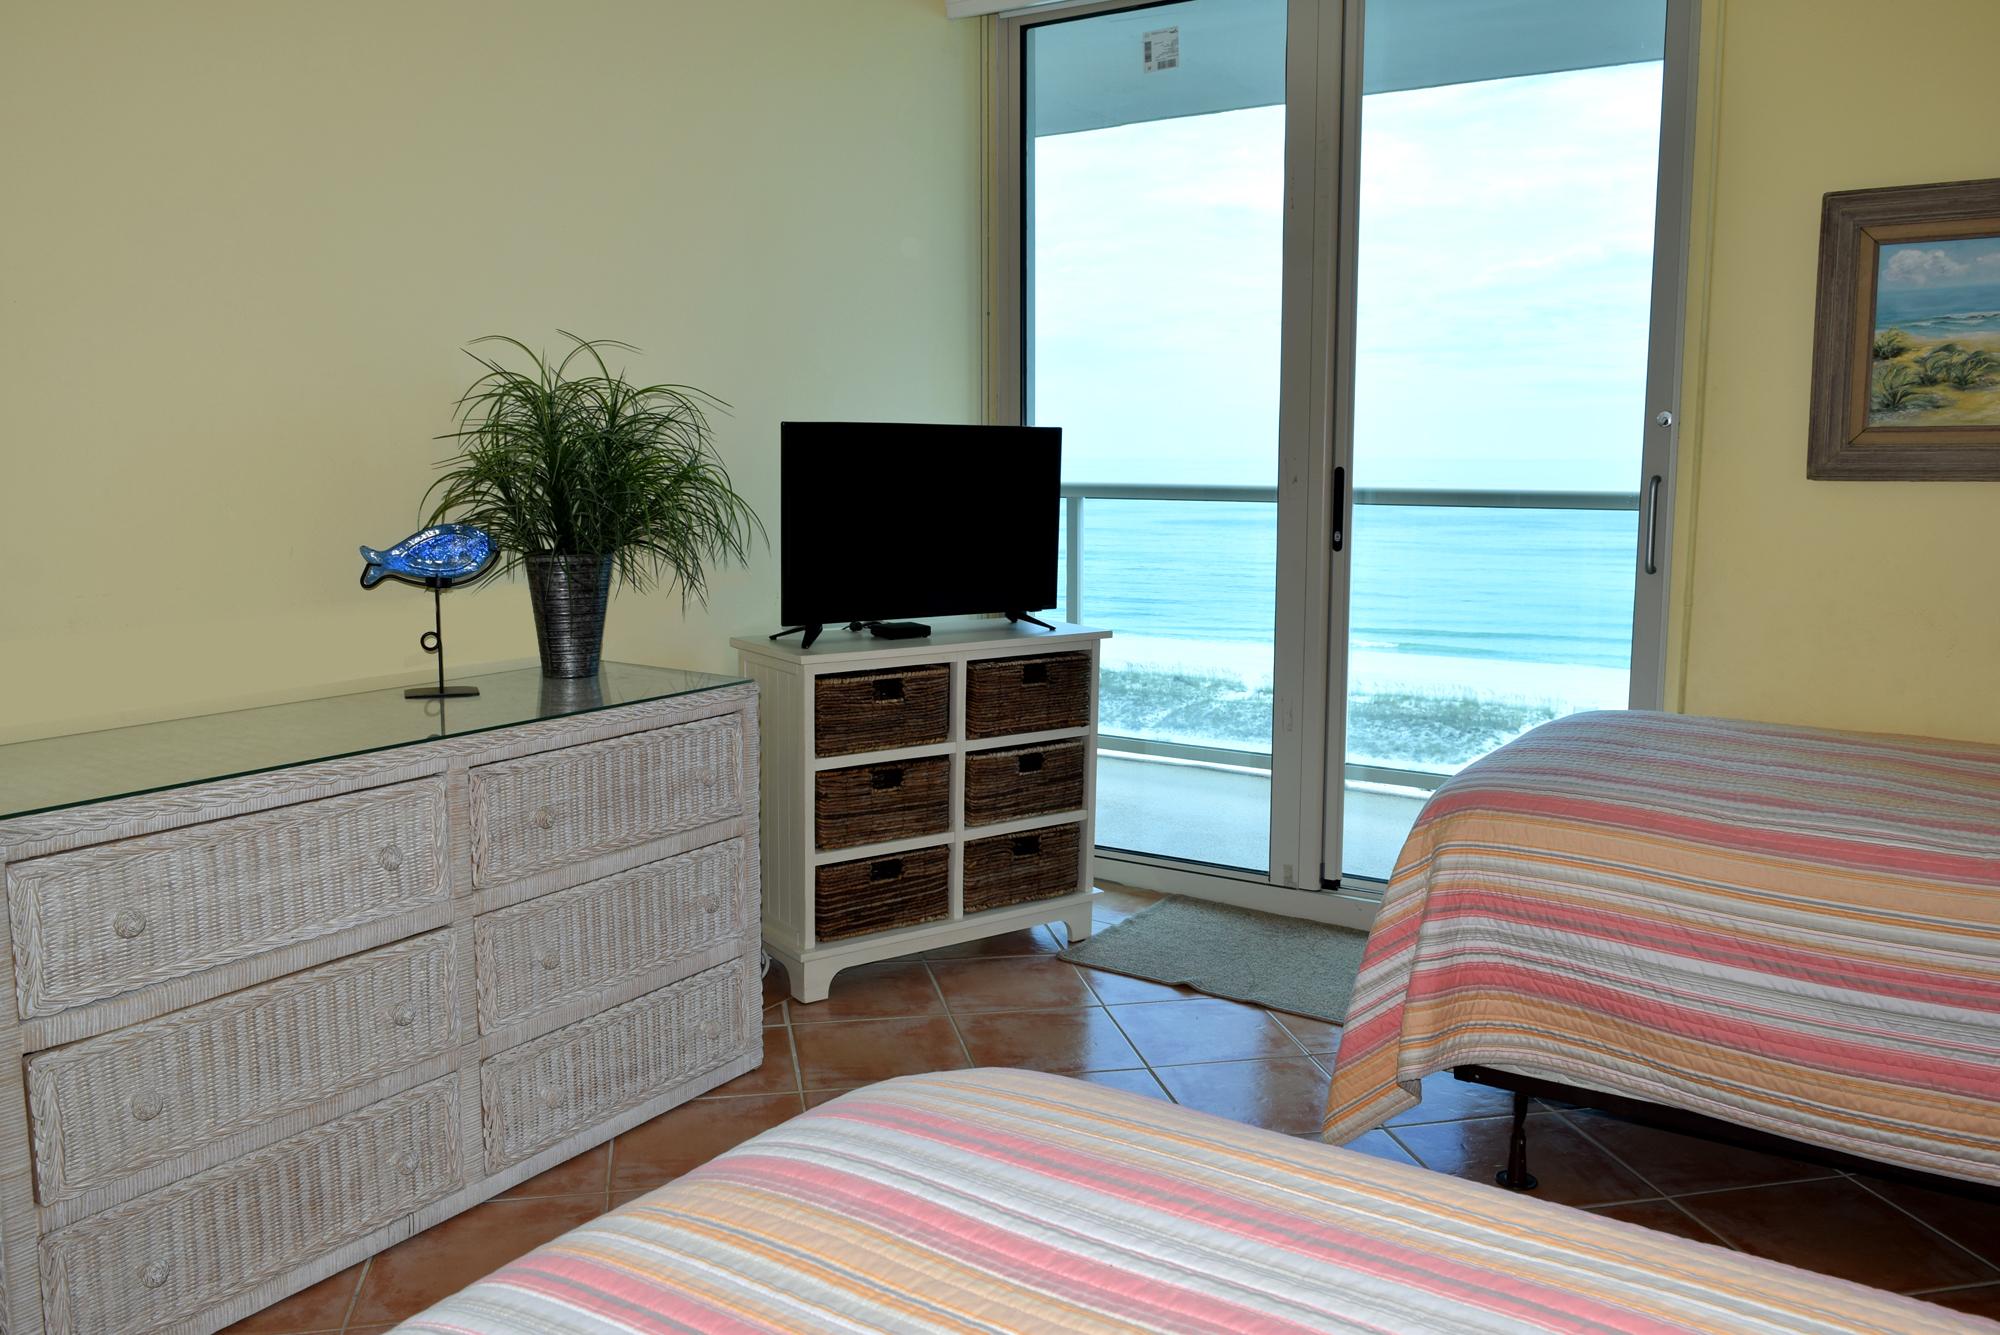 Sabine Yacht & Racquet Club #9D Condo rental in Sabine Yacht & Racquet Club ~ Pensacola Beach Condo Rentals by BeachGuide in Pensacola Beach Florida - #16